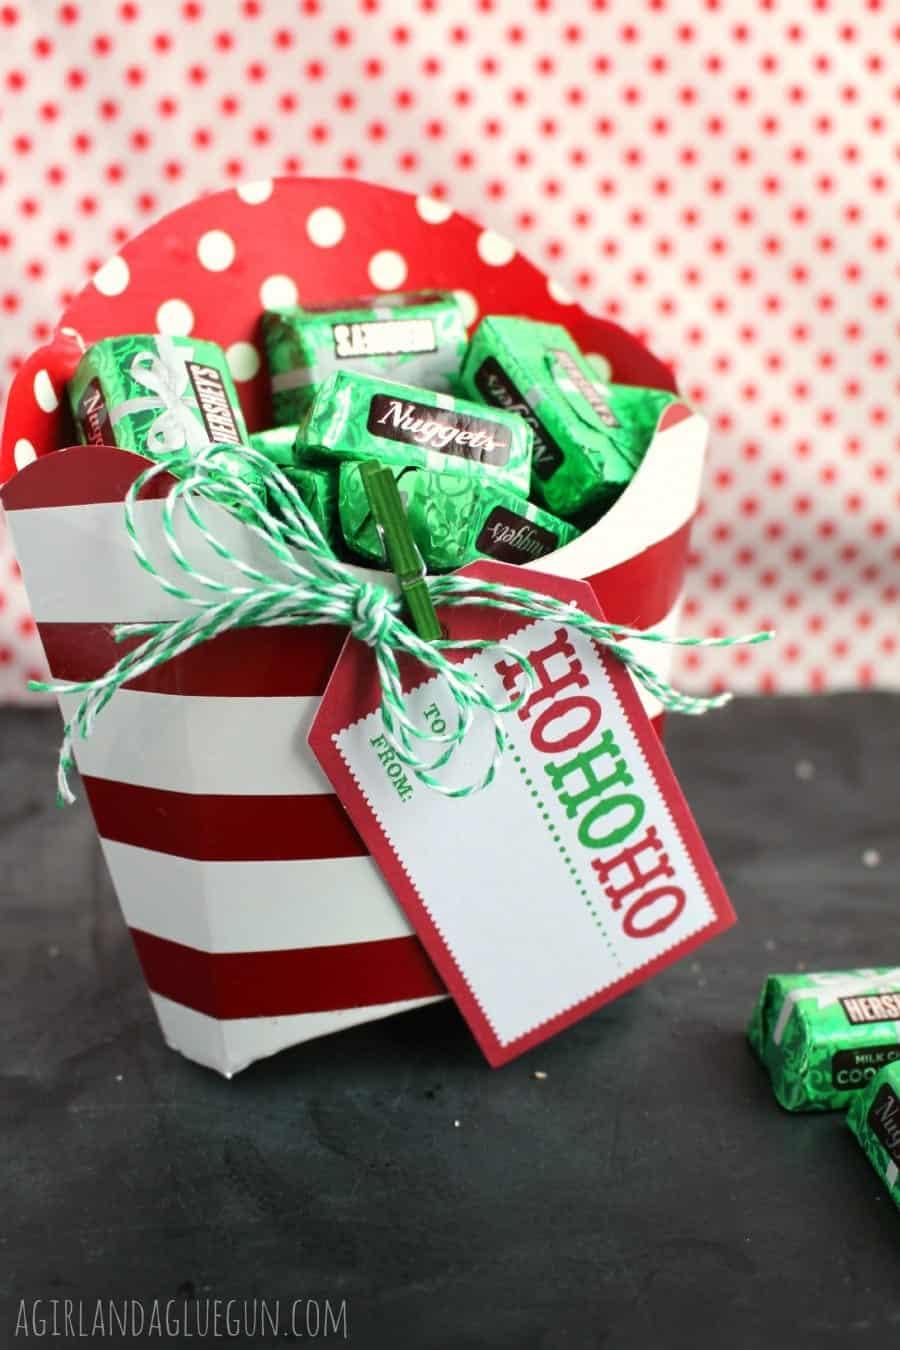 fry box holder for neighbor christmas treats